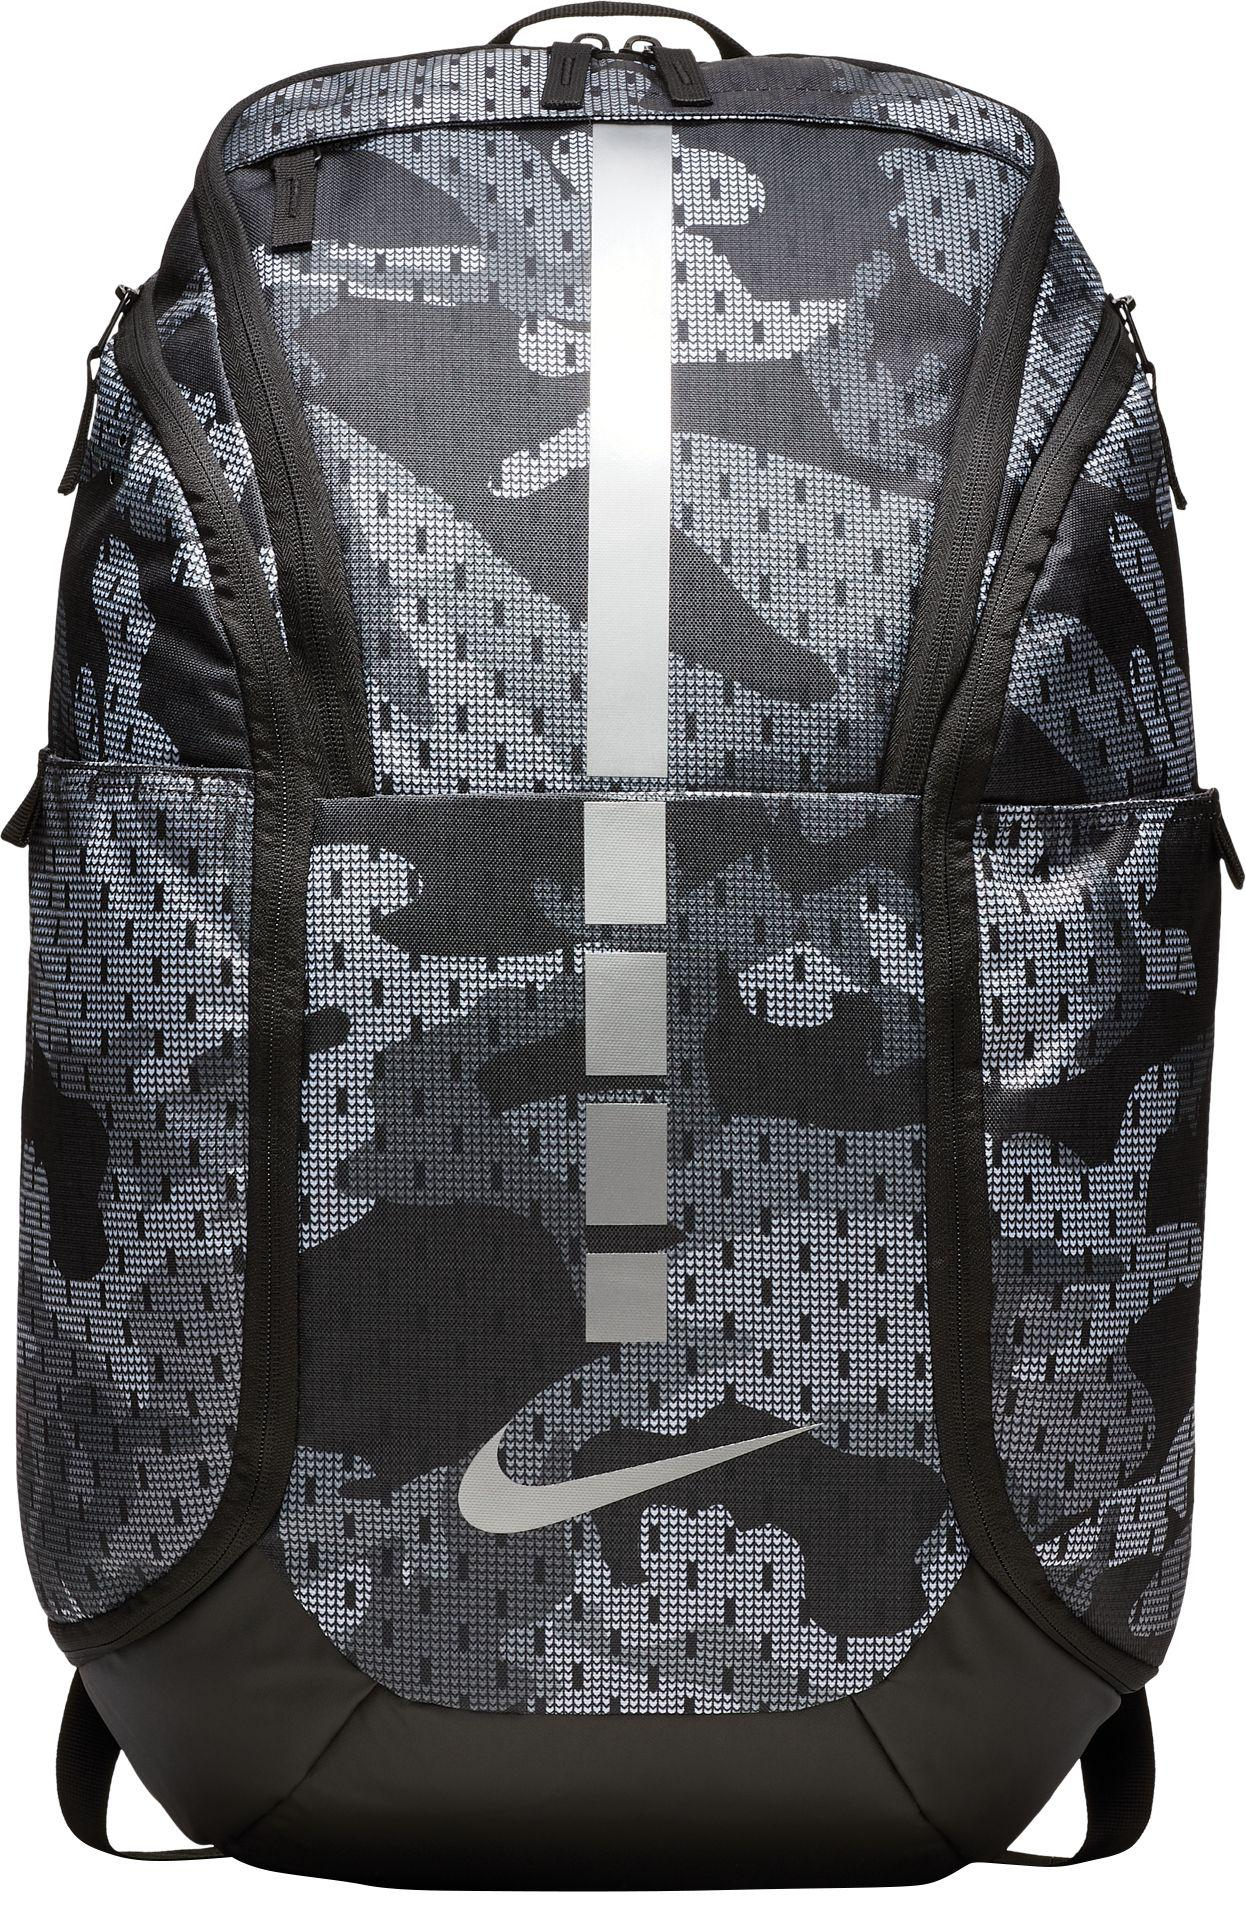 Nike - Multicolor Hoops Elite Pro Camo Basketball Backpack for Men - Lyst f9b1902cc8b53